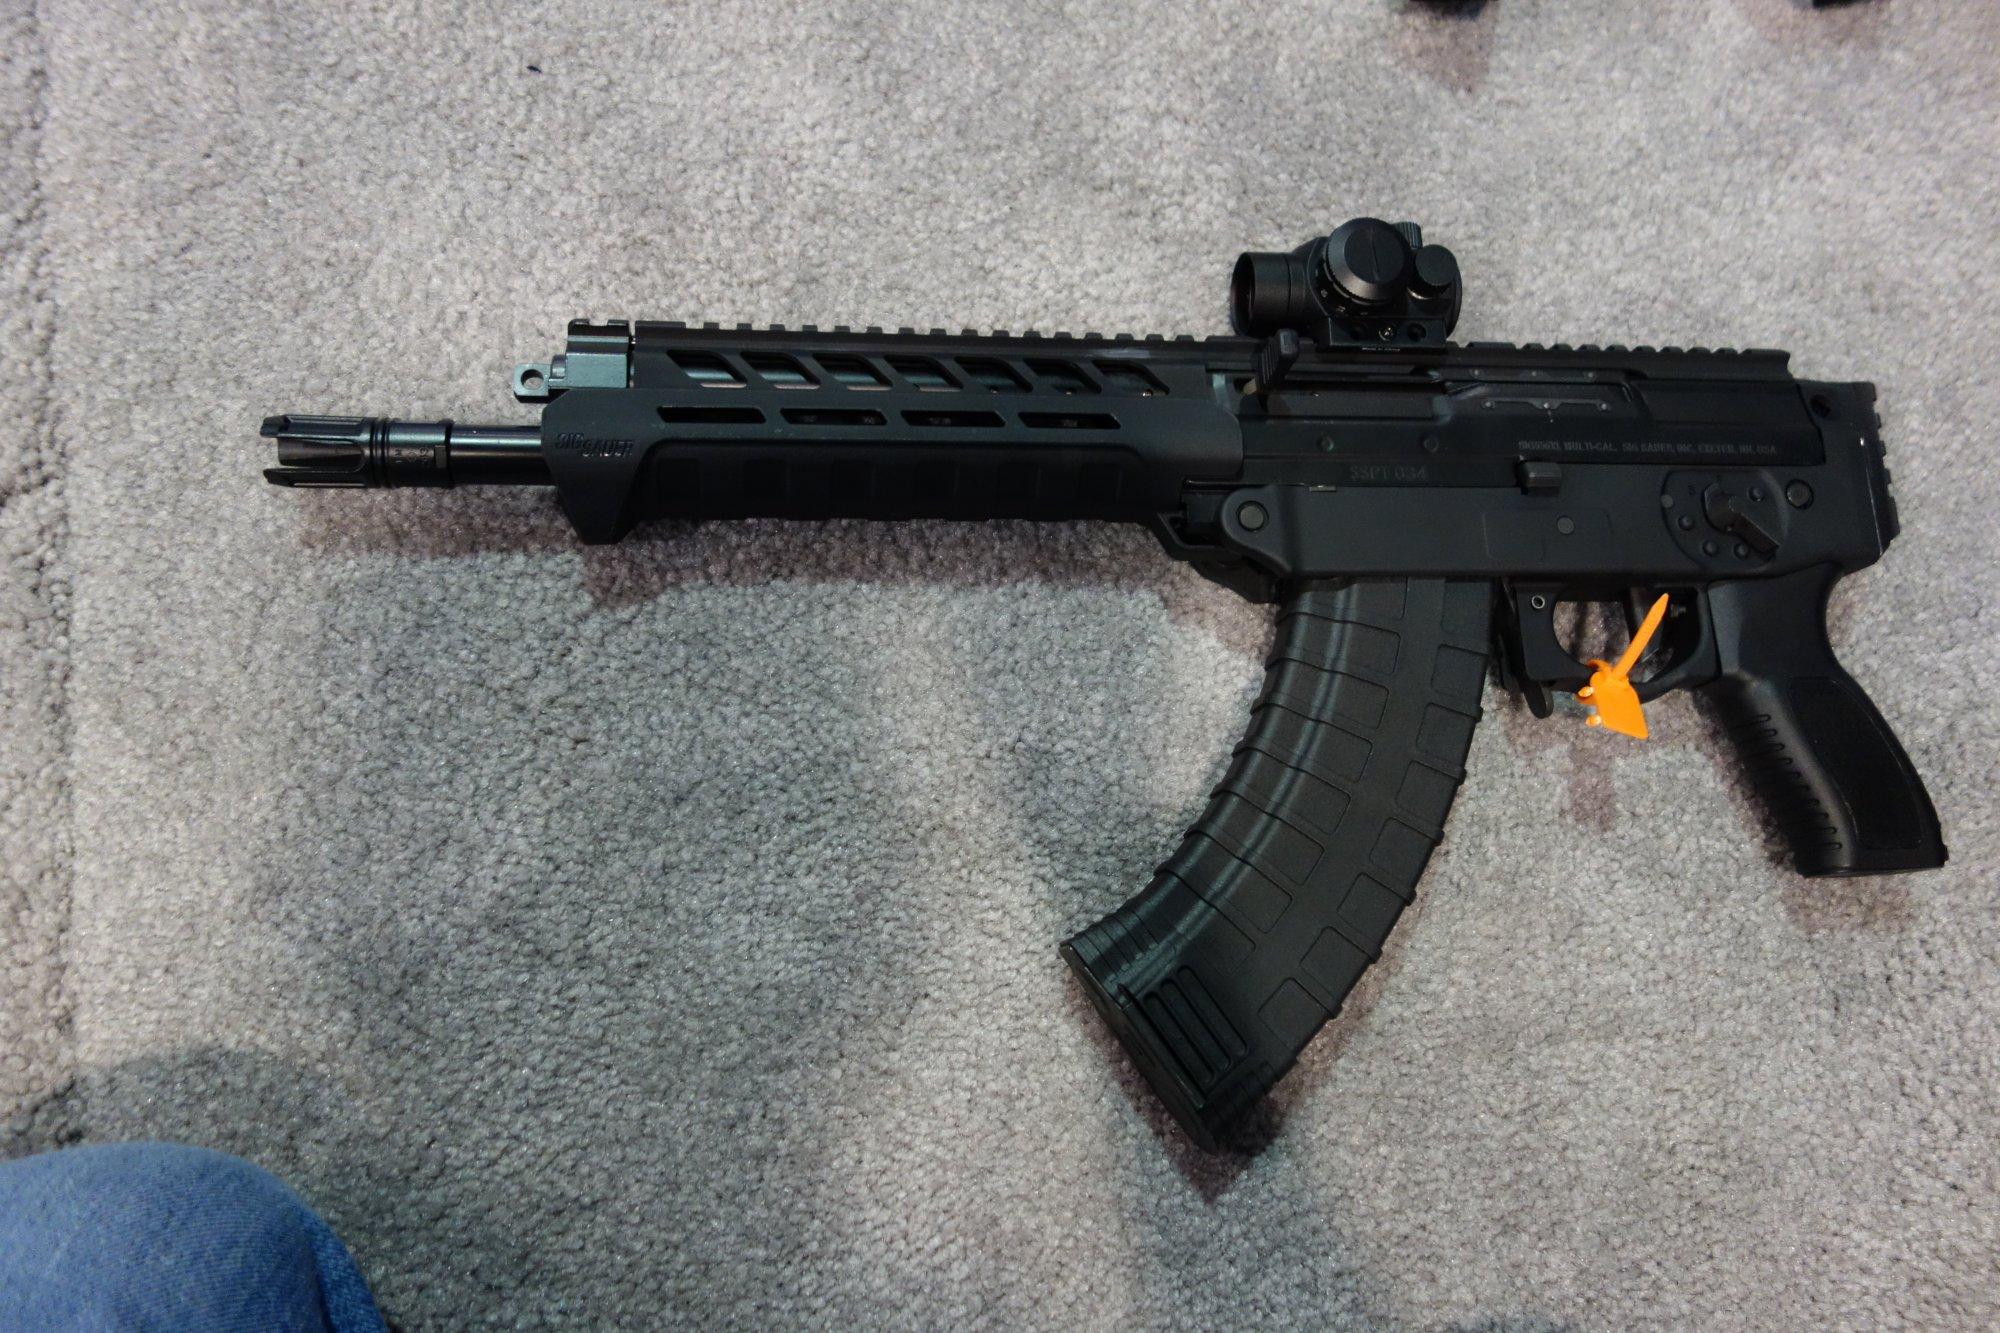 SIG SAUER SIG556xi 7.62x39mm Russian Configuration Semi Auto Only Modular Multi Caliber Combat Tactical Carbine Kalashnikov AK 47 AKM SHOT Show 2014 1 15 14 David Crane DefenseReview.com DR 6 SIG SAUER SIG556xi Modular, Multi Caliber (5.56mm NATO, 300 AAC Blackout/300BLK, 7.62x39mm Russian) Gas Piston/Op Rod Combat/Tactical Rifle/Carbine/SBR with Kalashnikov AK 47/AKM Configuration Capability!